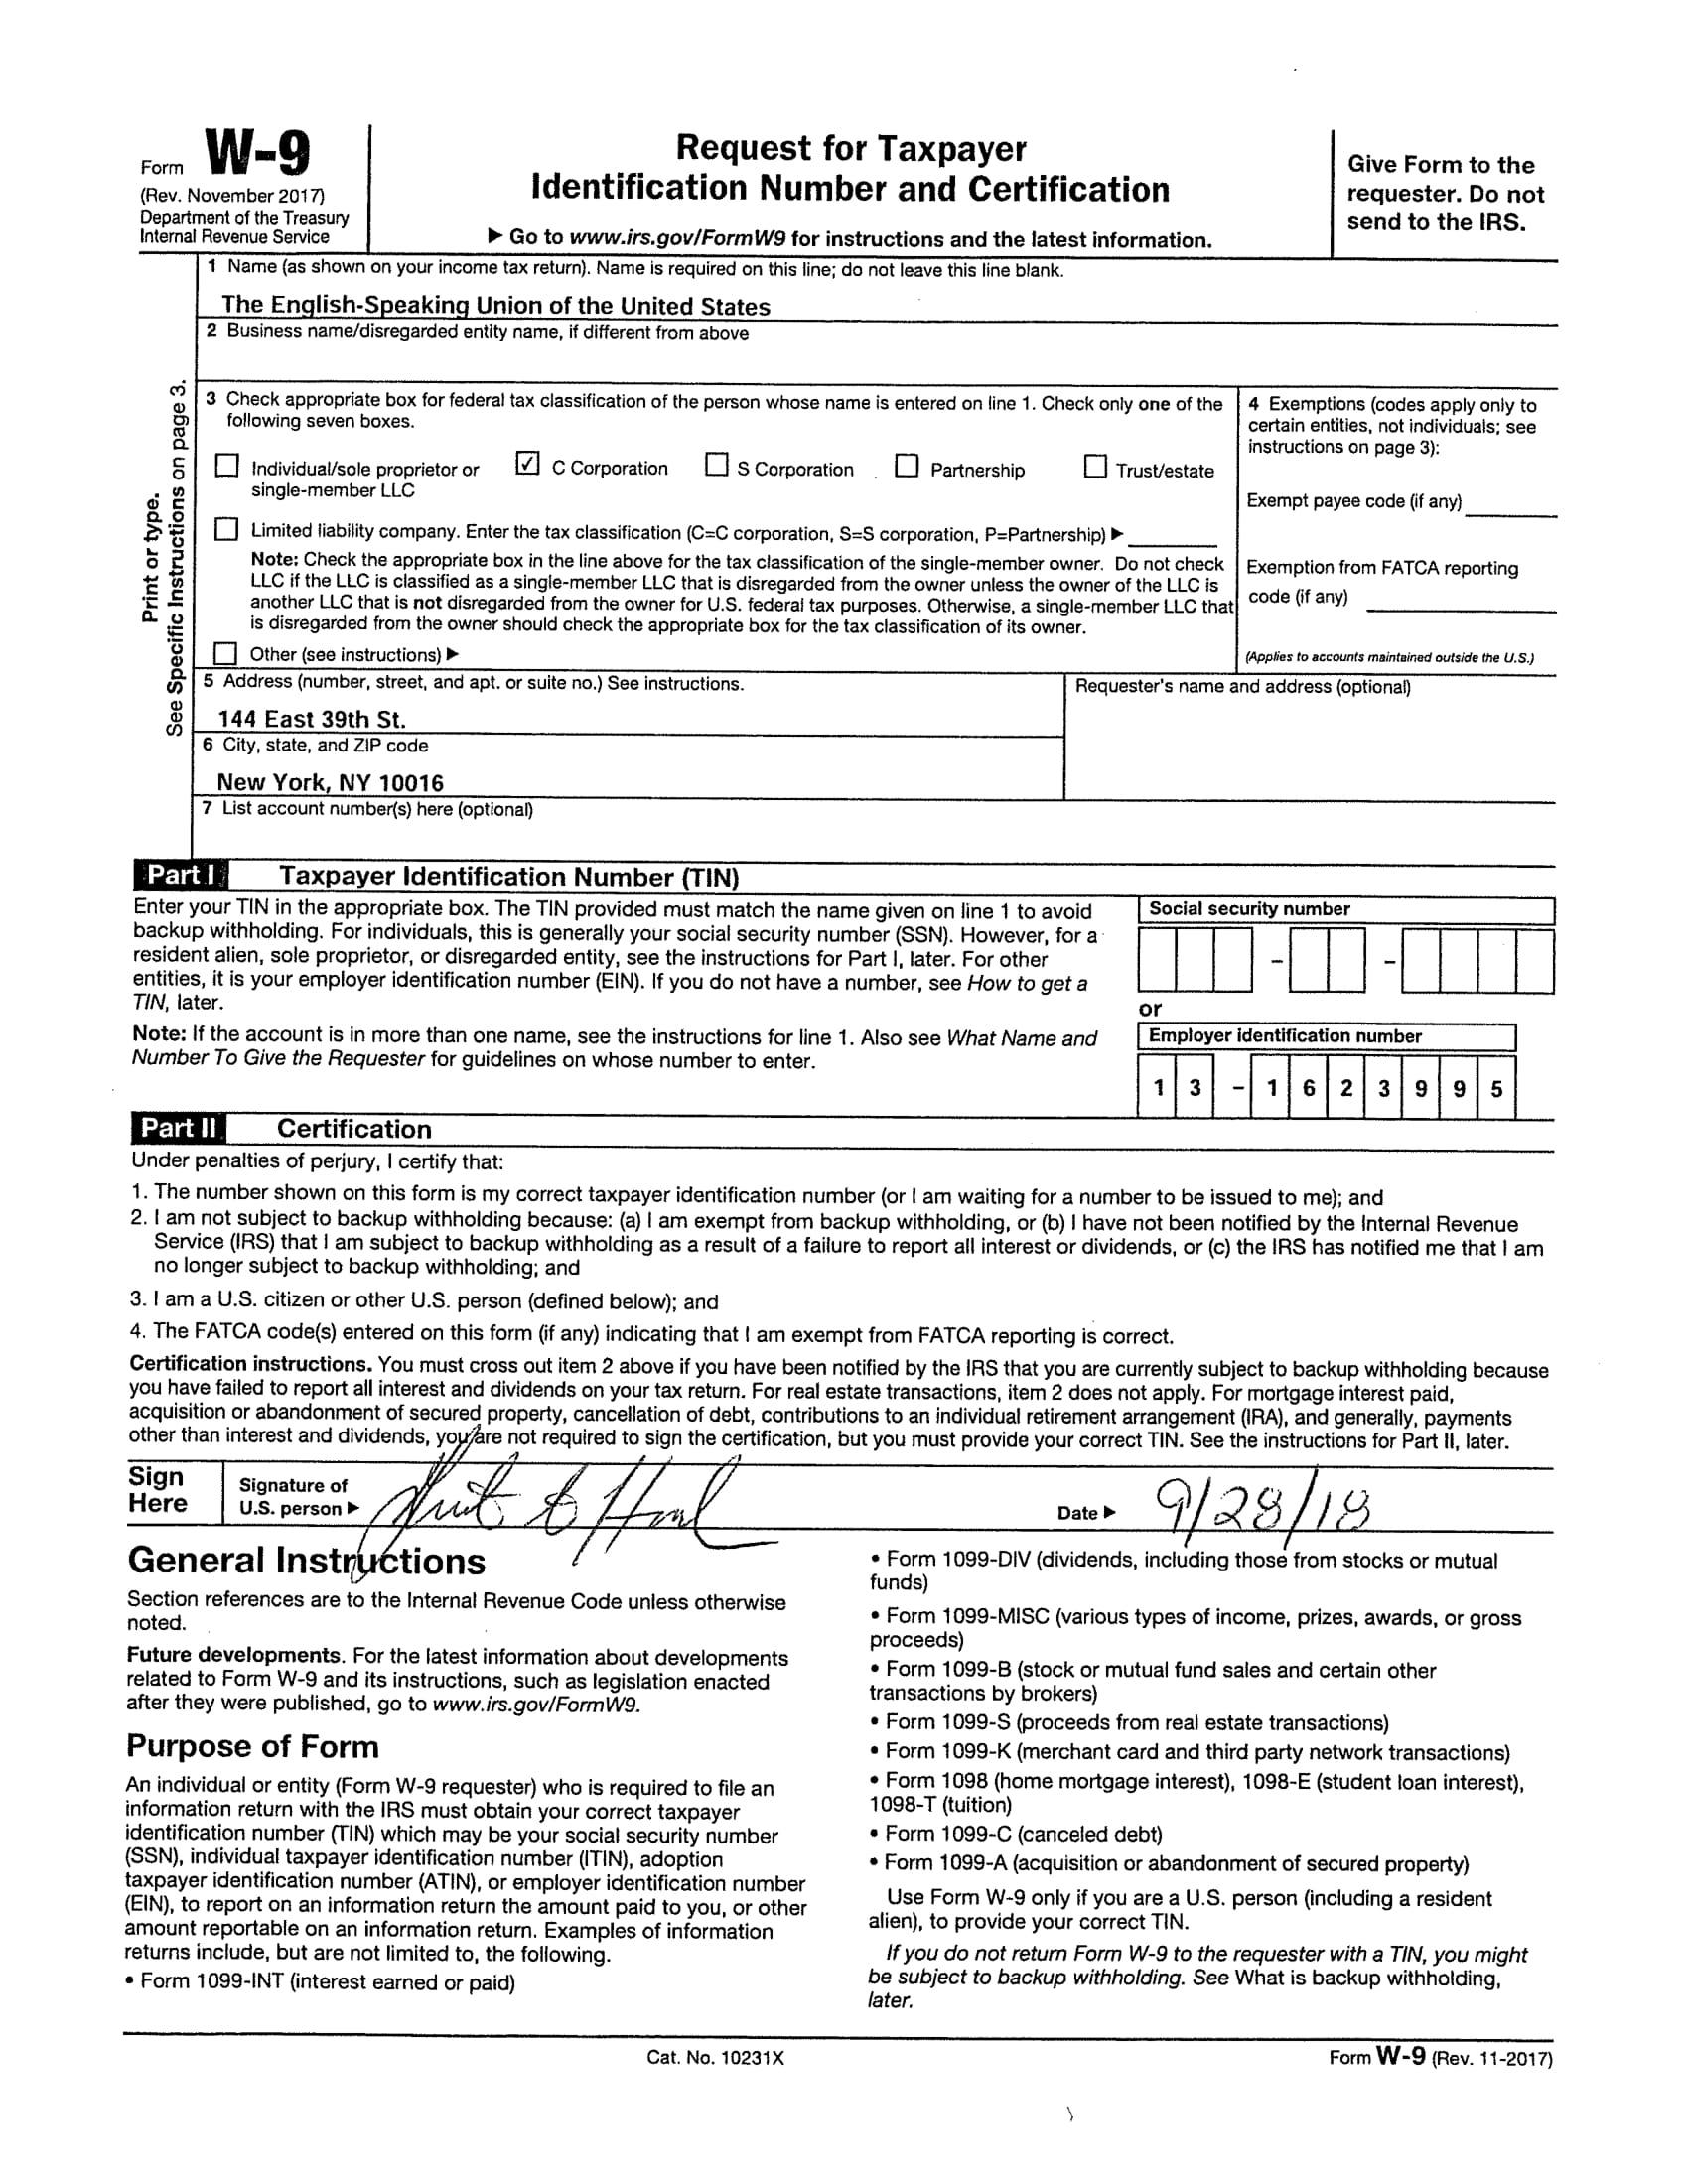 Collect 2020 W-9 Form | Calendar Printables Free Blank regarding W 9 Blank Form